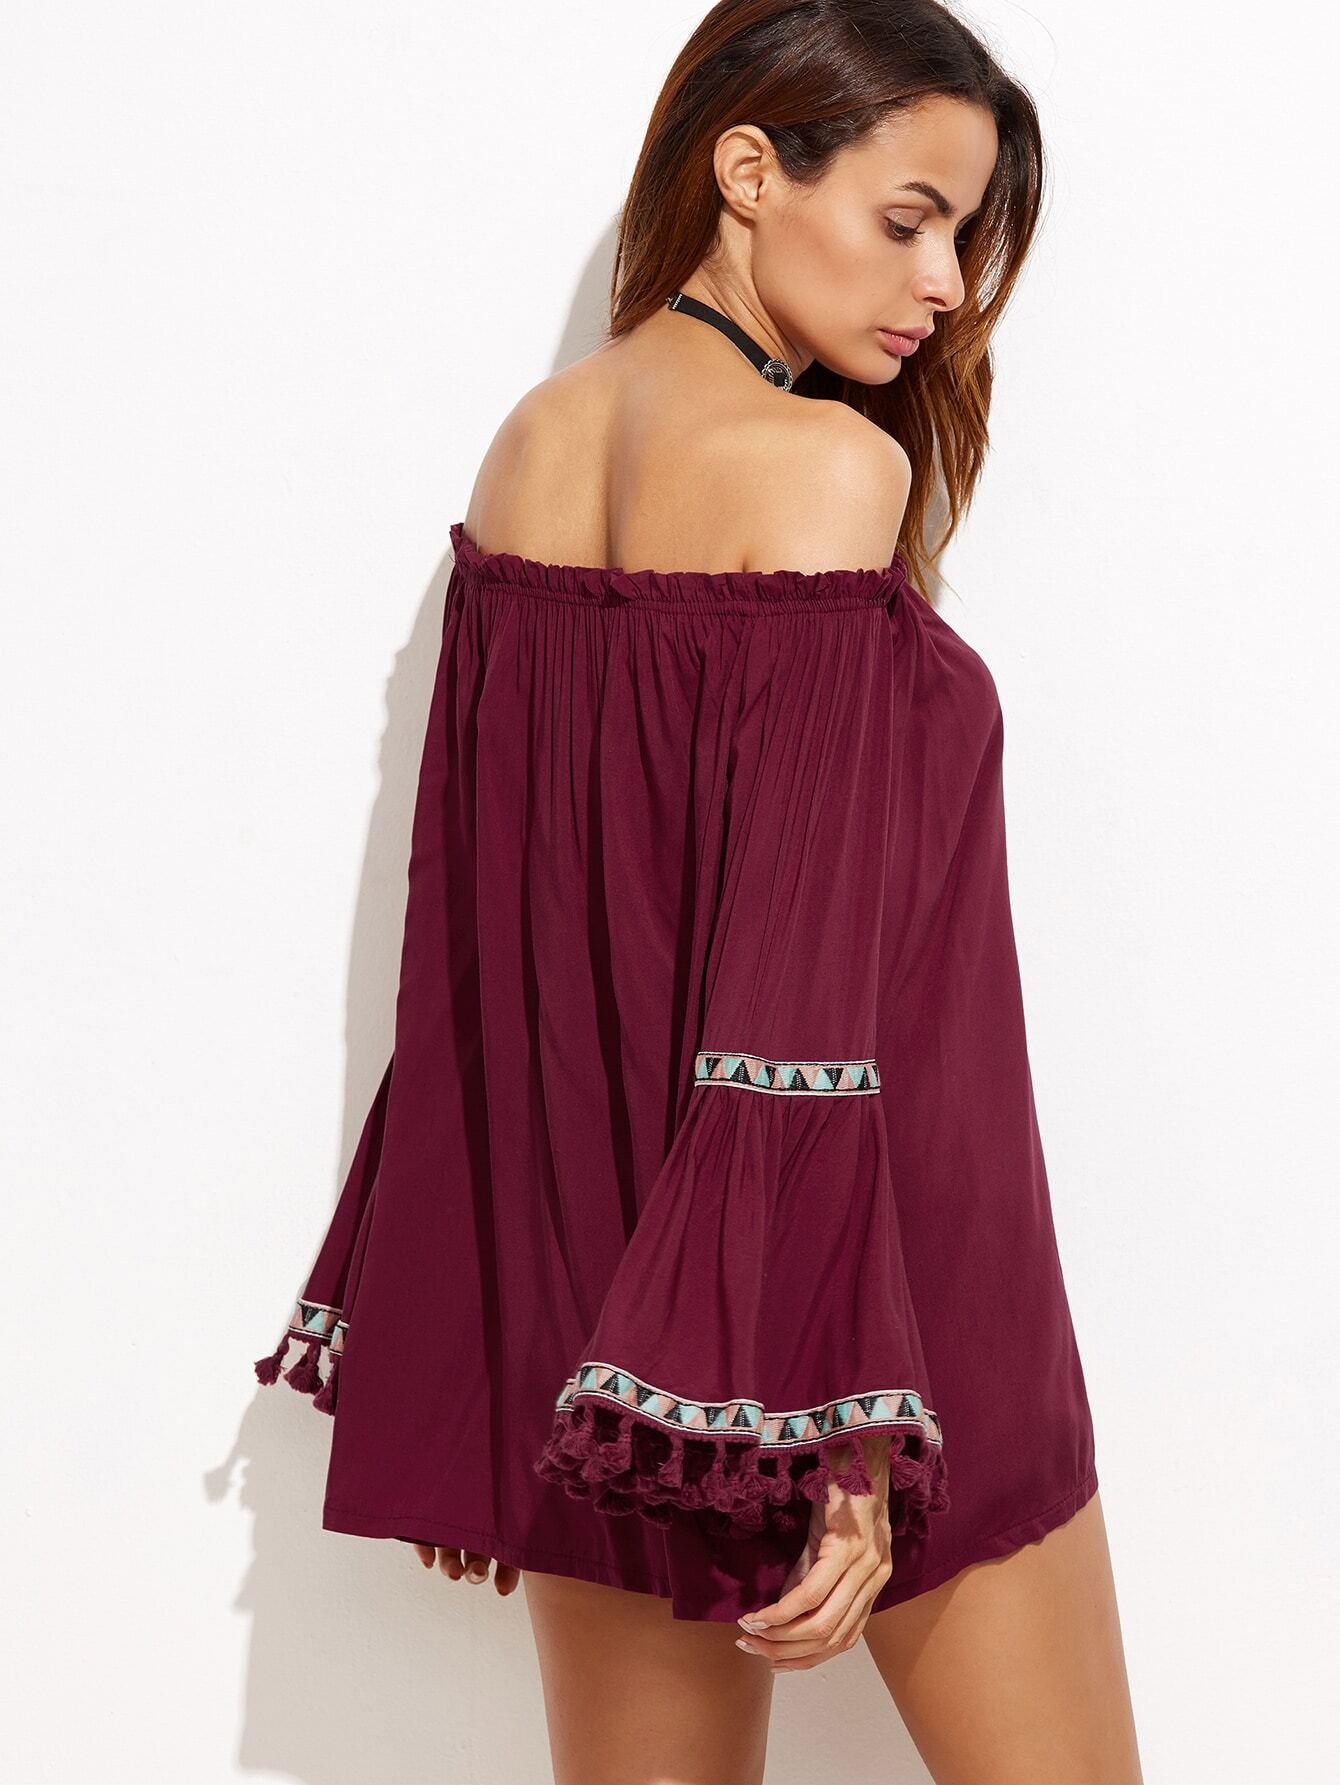 blouse160914001_2